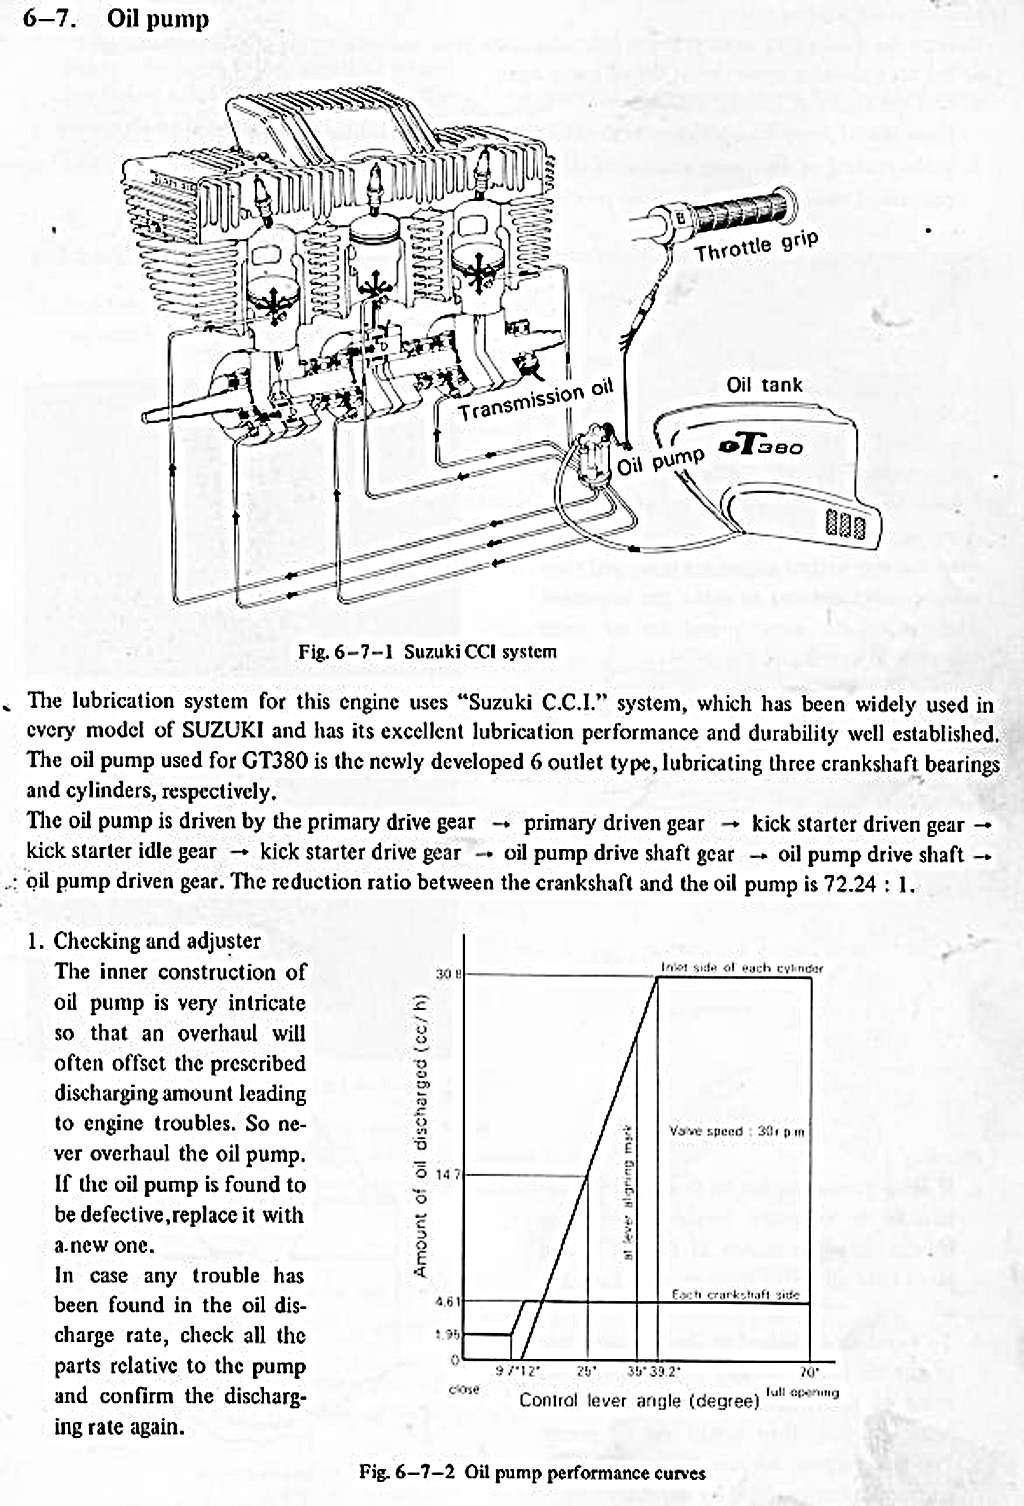 Snap Kikker 5150 Bobber Wiring Diagram Suzuki Gt 380 Gn 400 Elsalvadorla